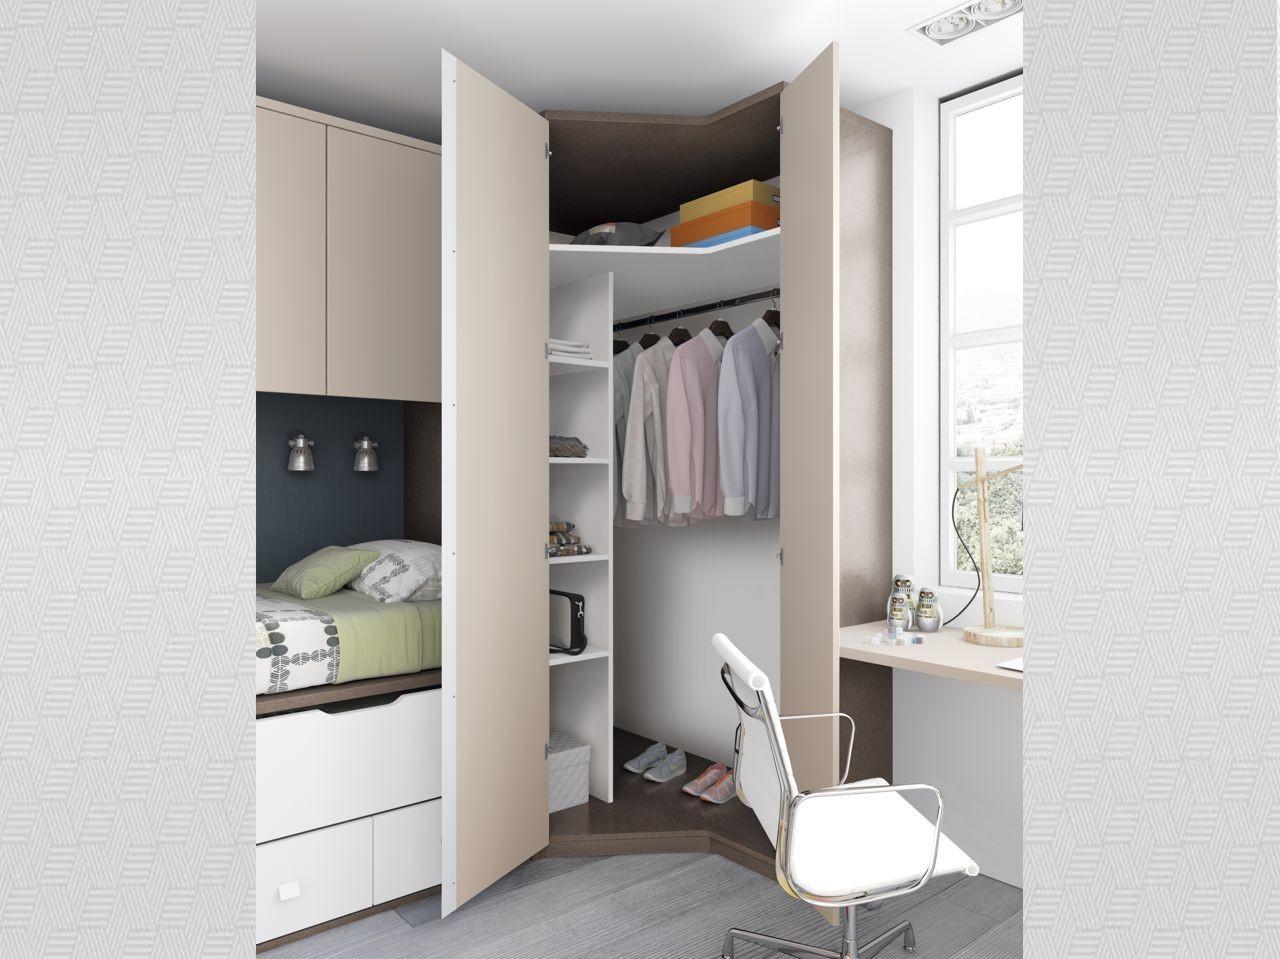 Blog dormitorios juveniles com armarios de rinc n para - Armarios juveniles rinconera ...